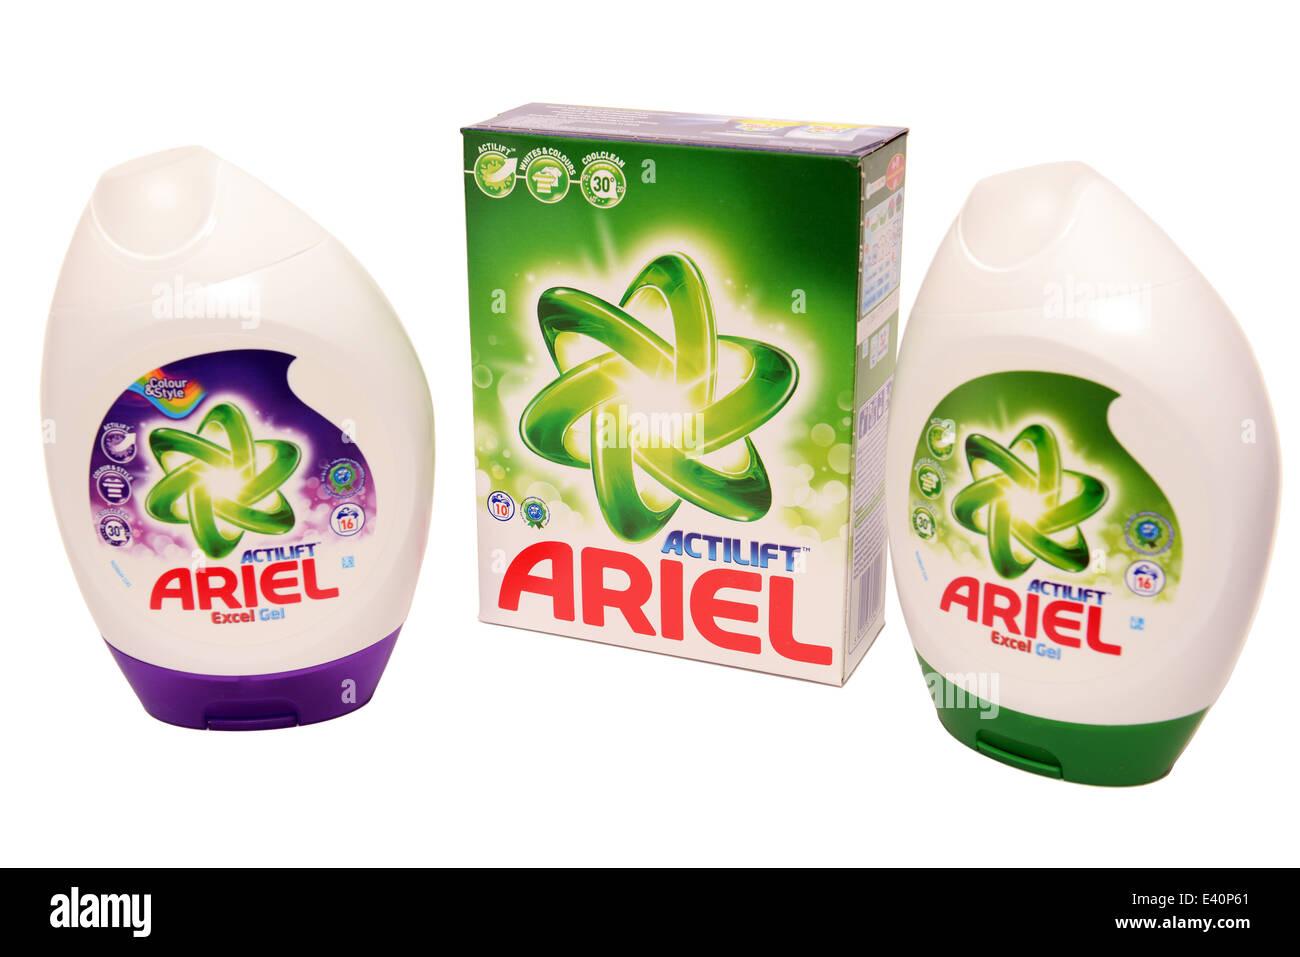 Ariel Laundry Detergent Stock Photo 71317513